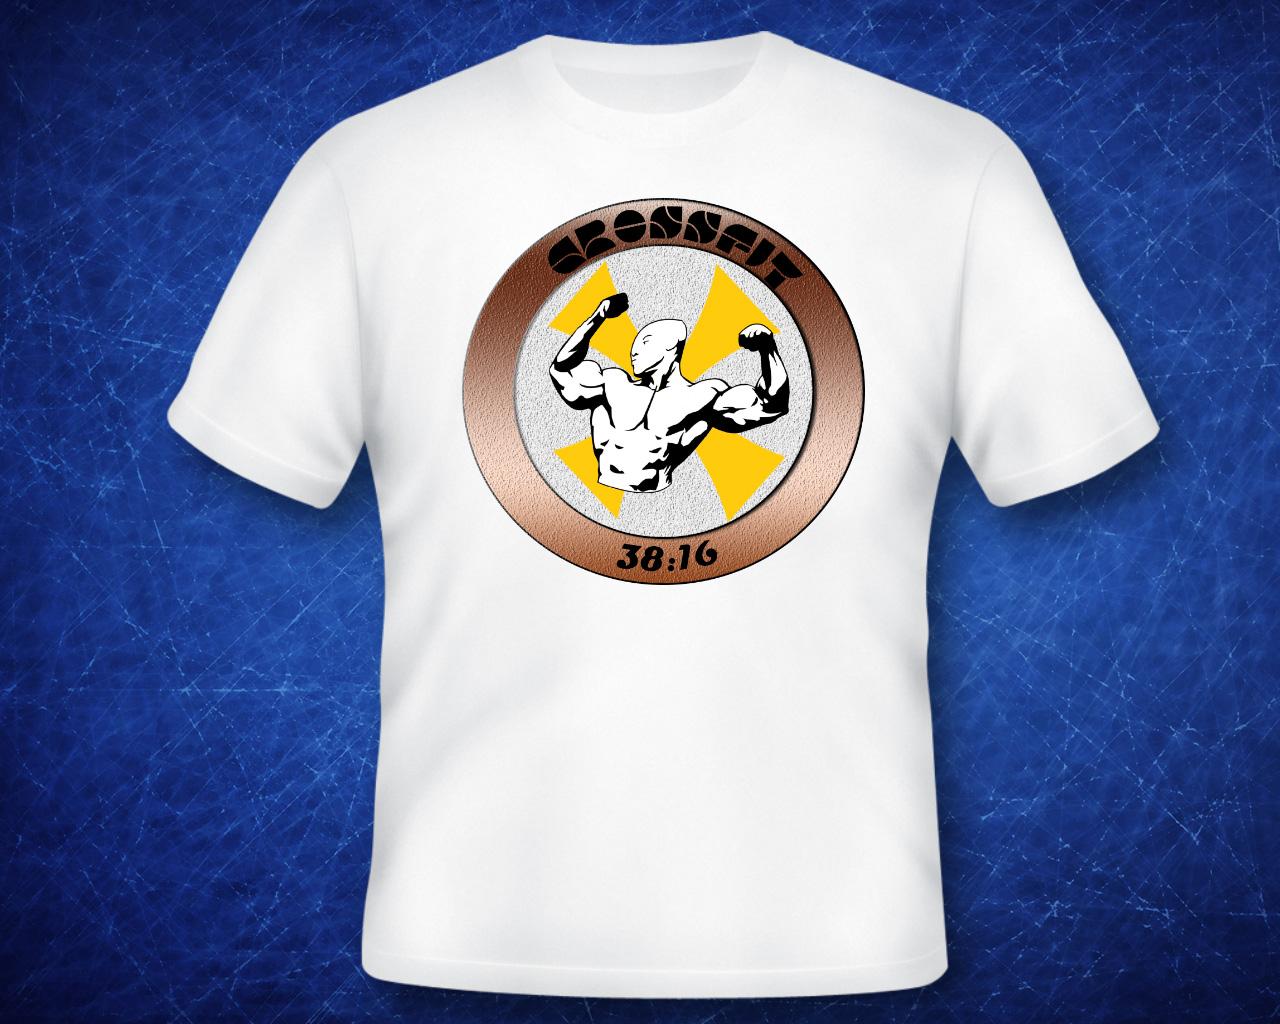 Logo Design by Kartheek Kittu - Entry No. 3 in the Logo Design Contest Fun Logo Design for Personal Trainer.